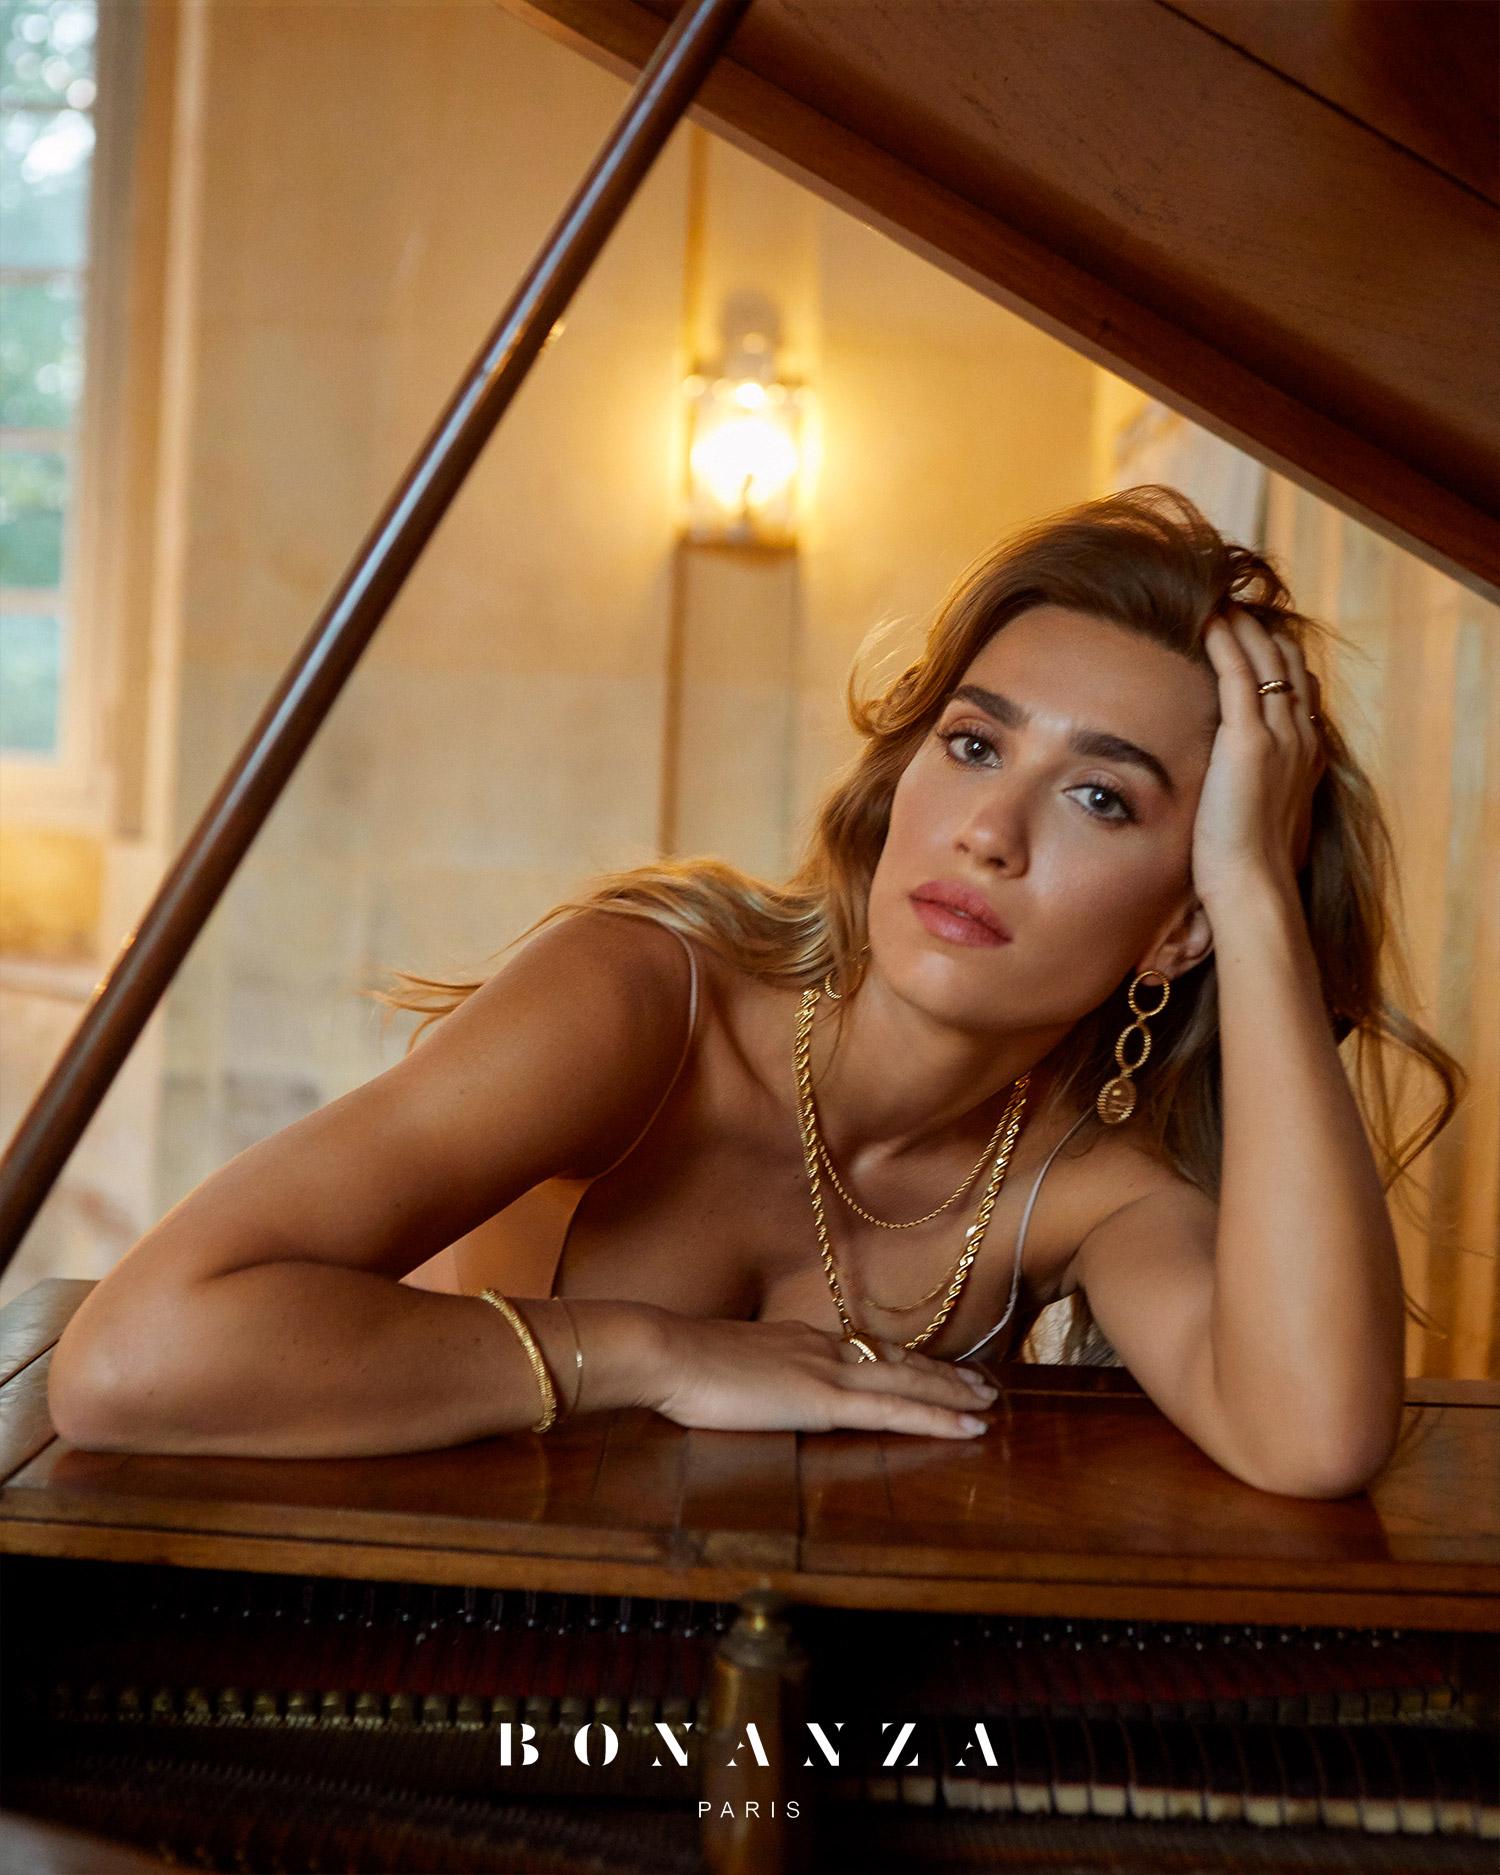 La Madone au piano